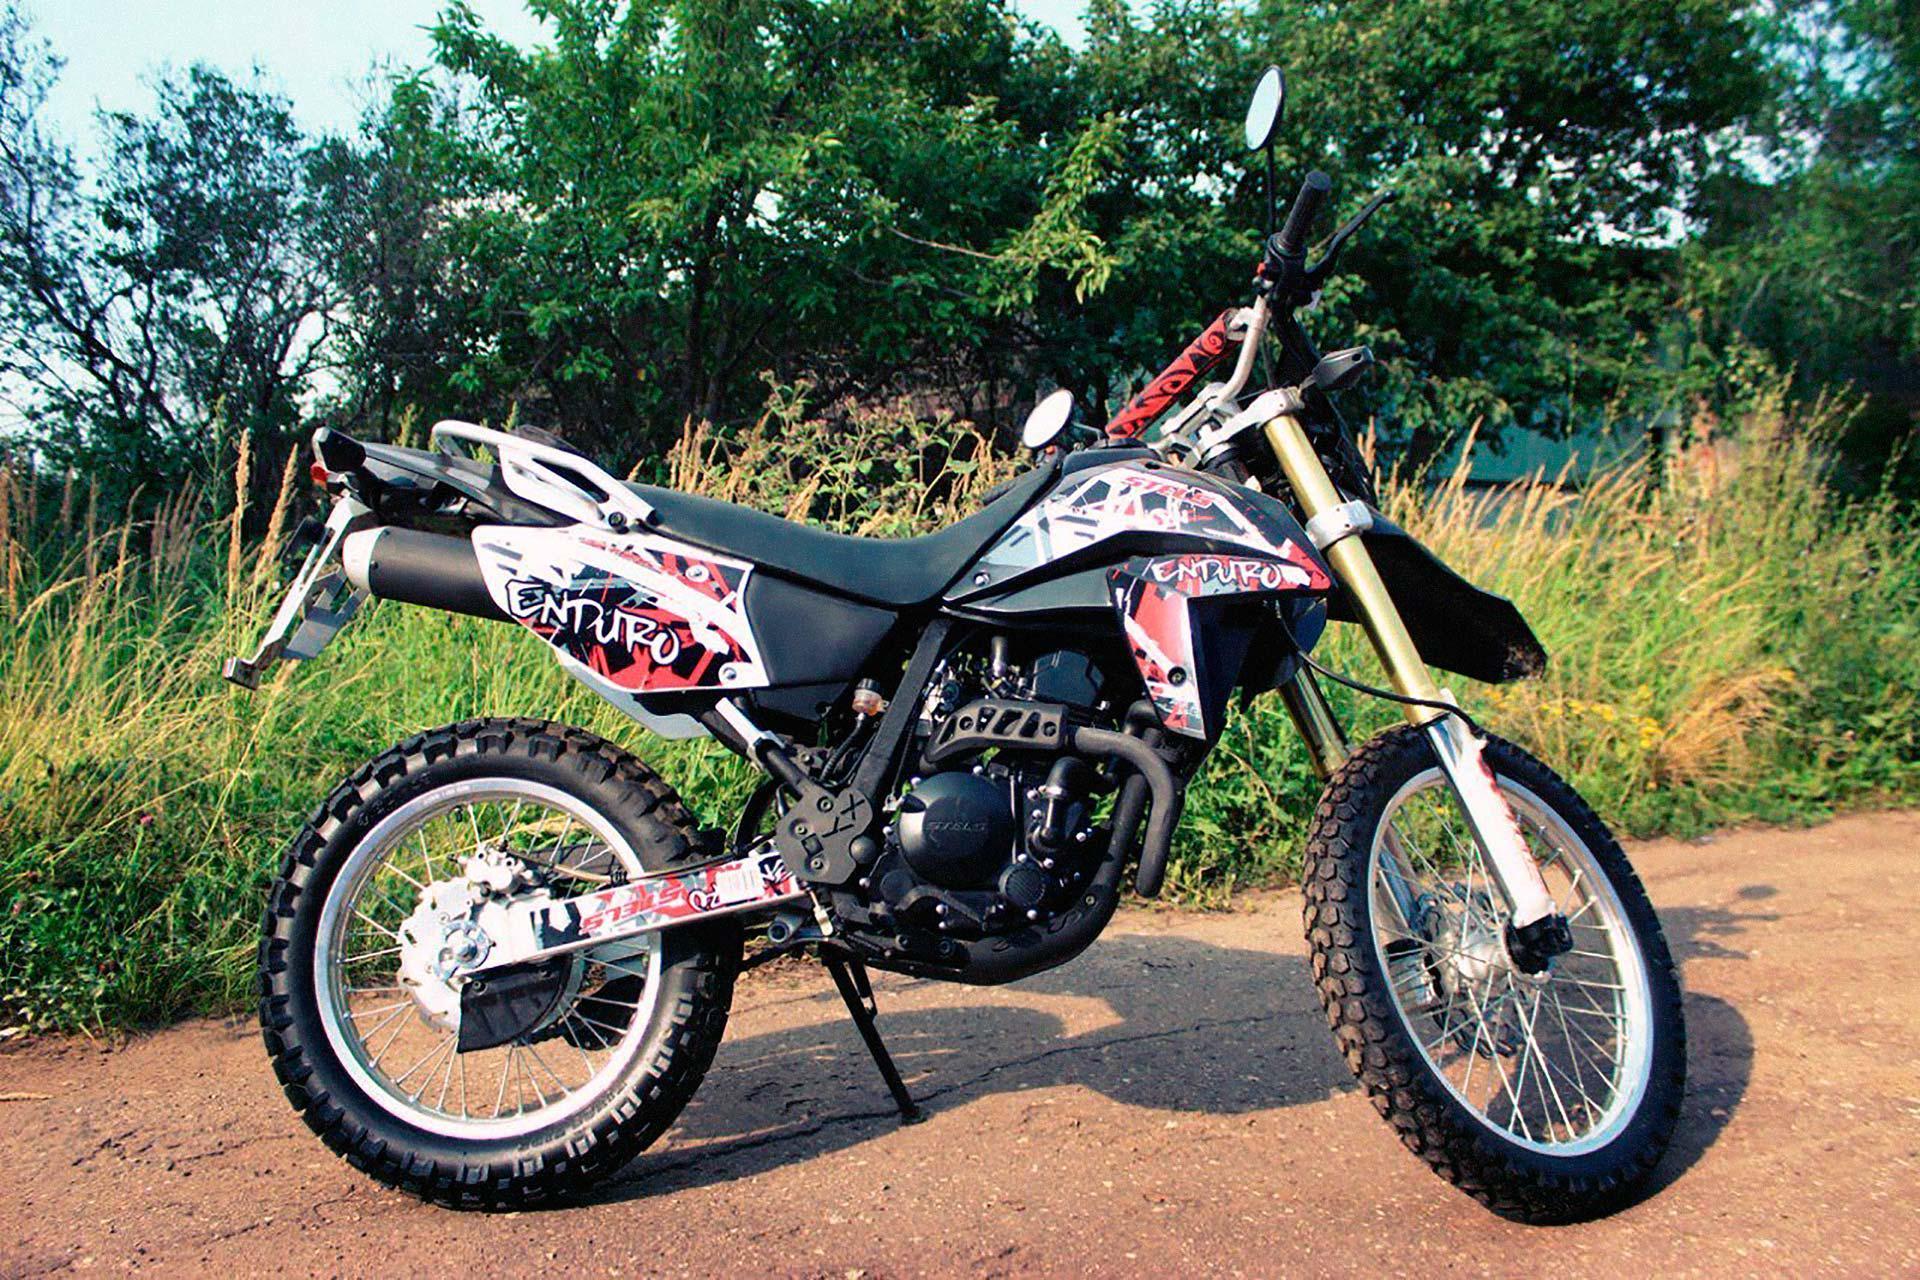 Запчасти для мотоциклов Стелс Эндуро